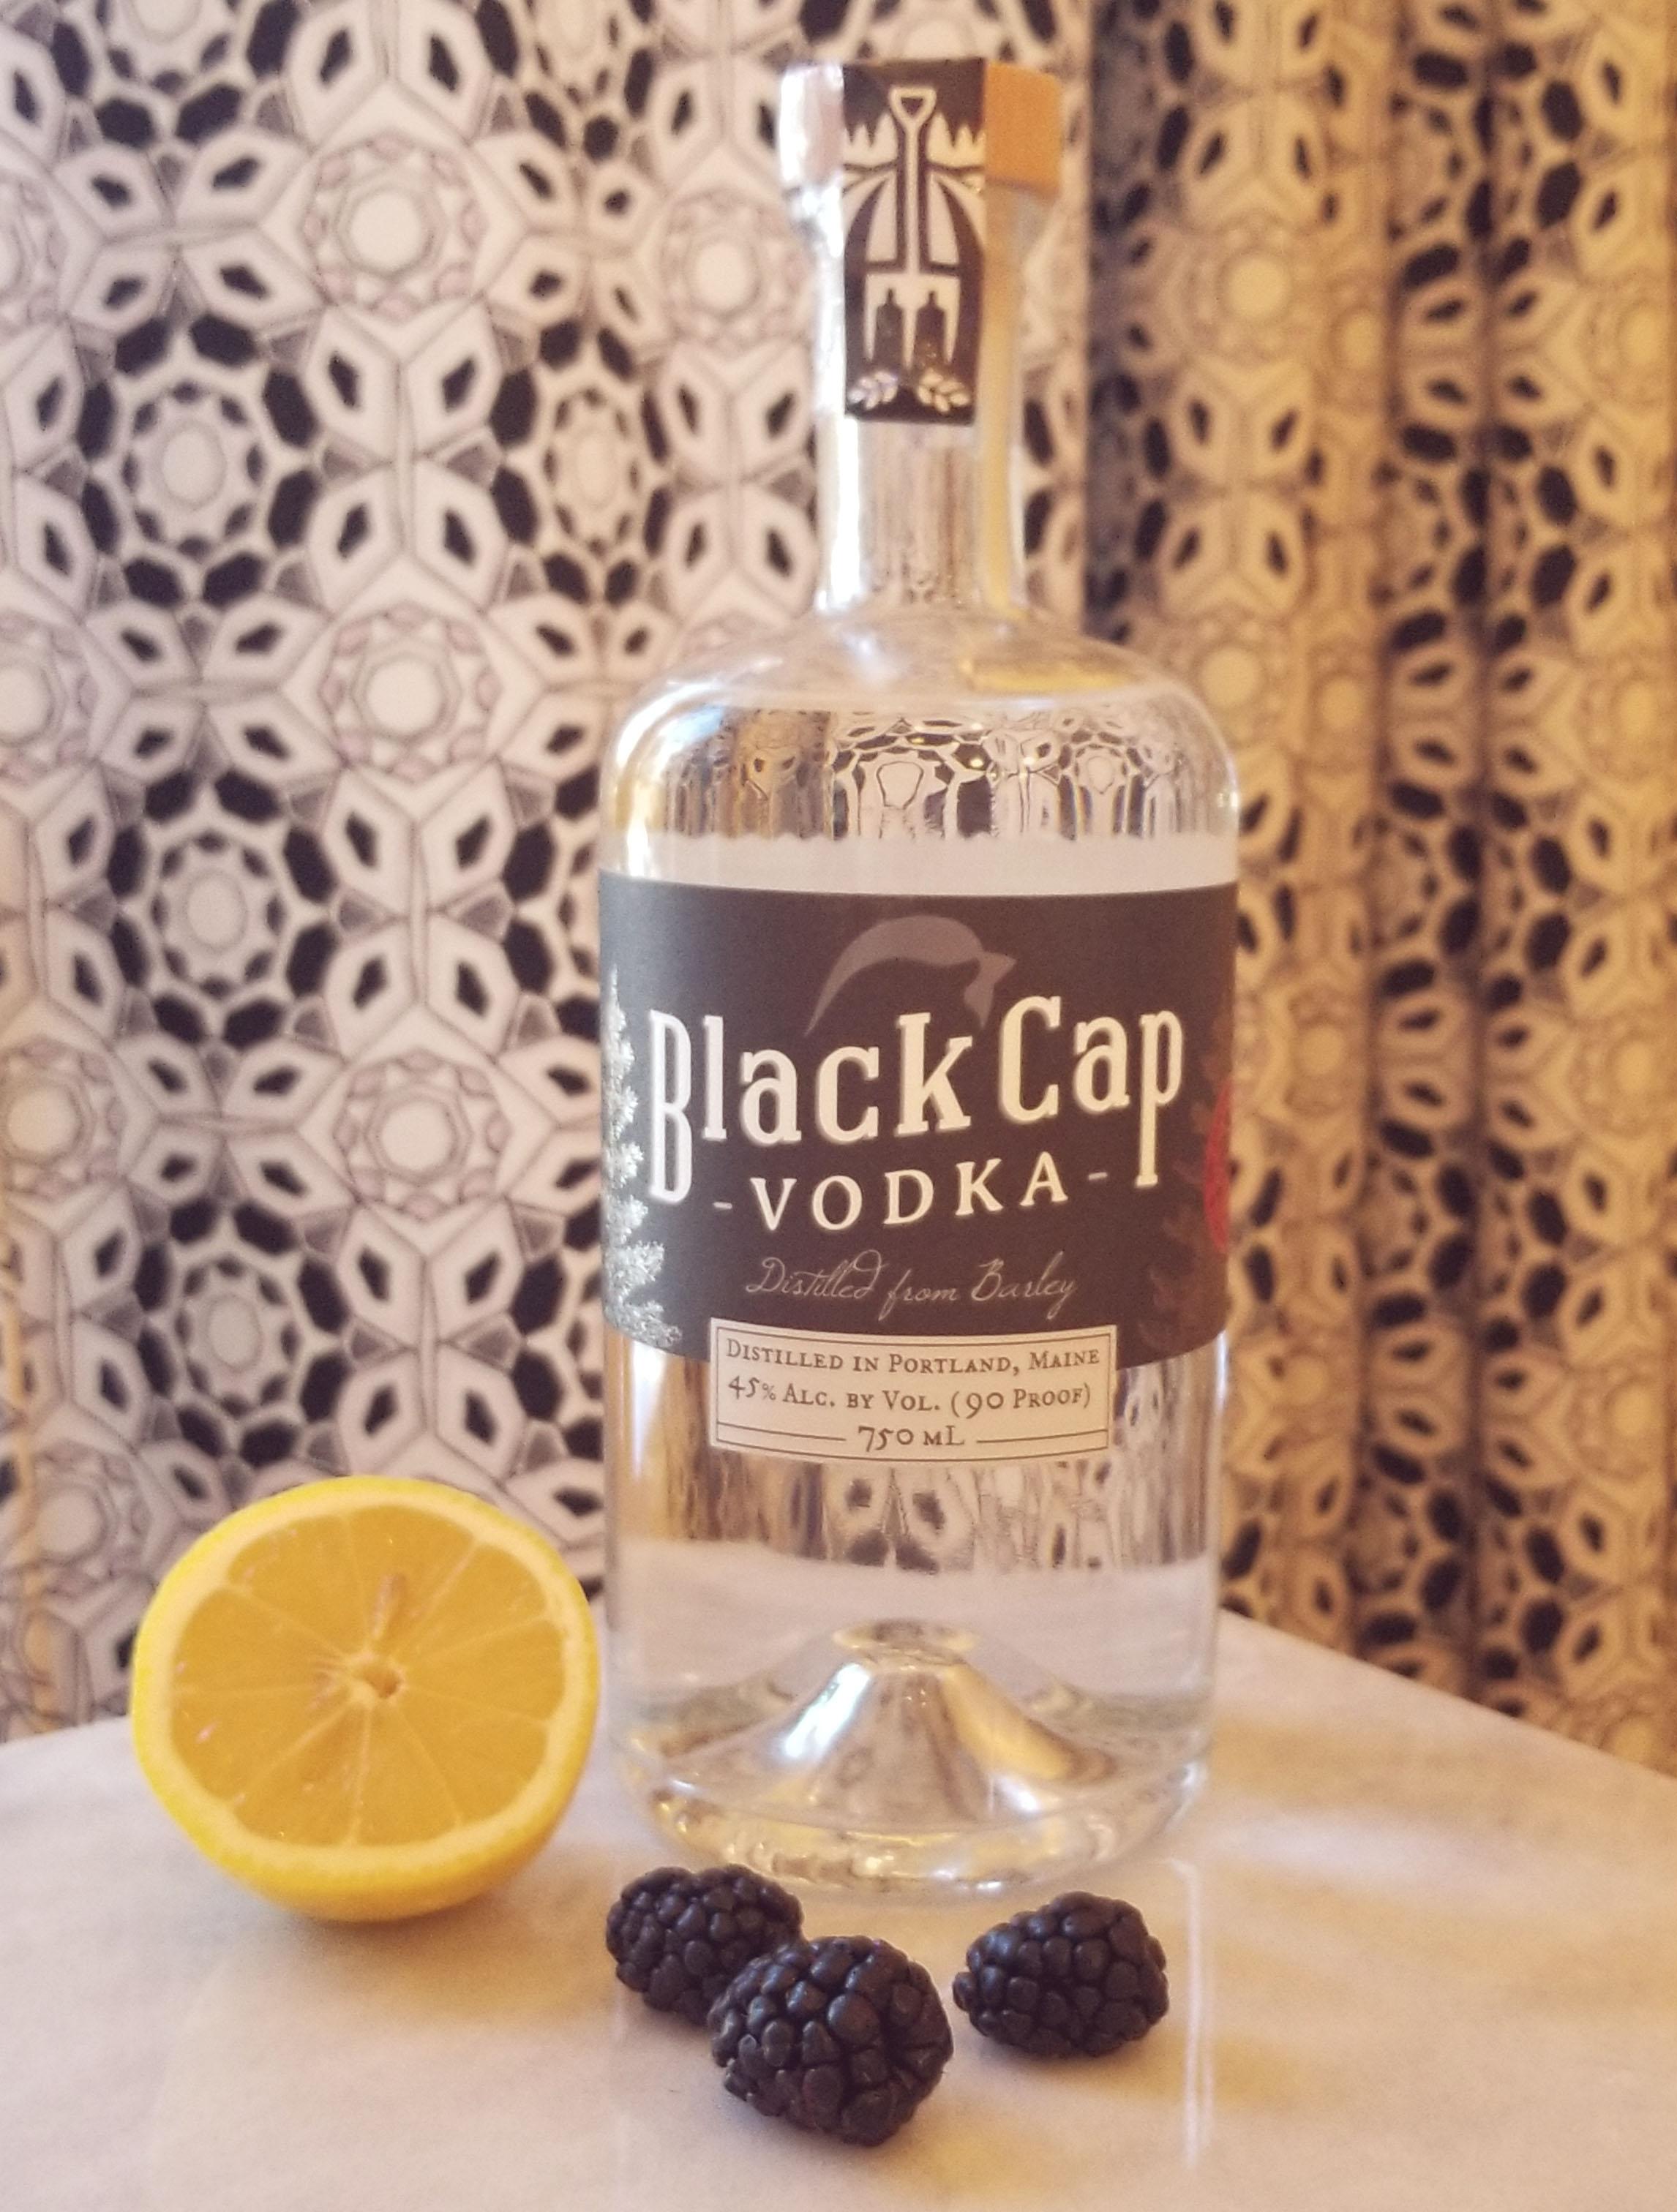 blackcapvodkabottle.jpg